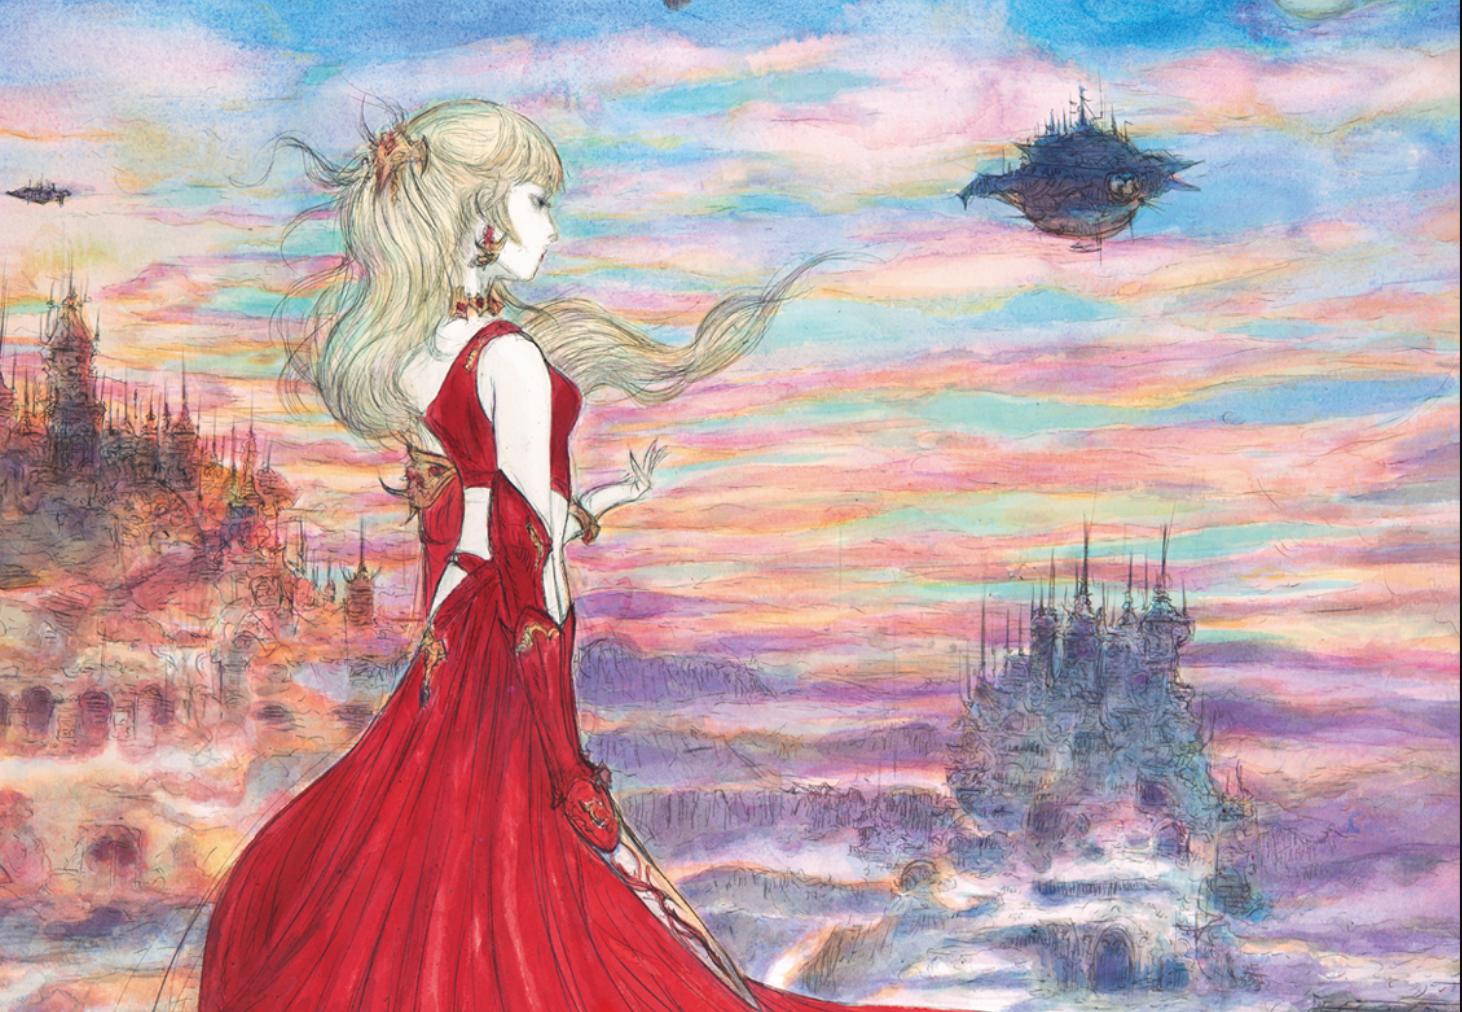 How To Get Into Final Fantasy XIV In 2019 | Kotaku Australia